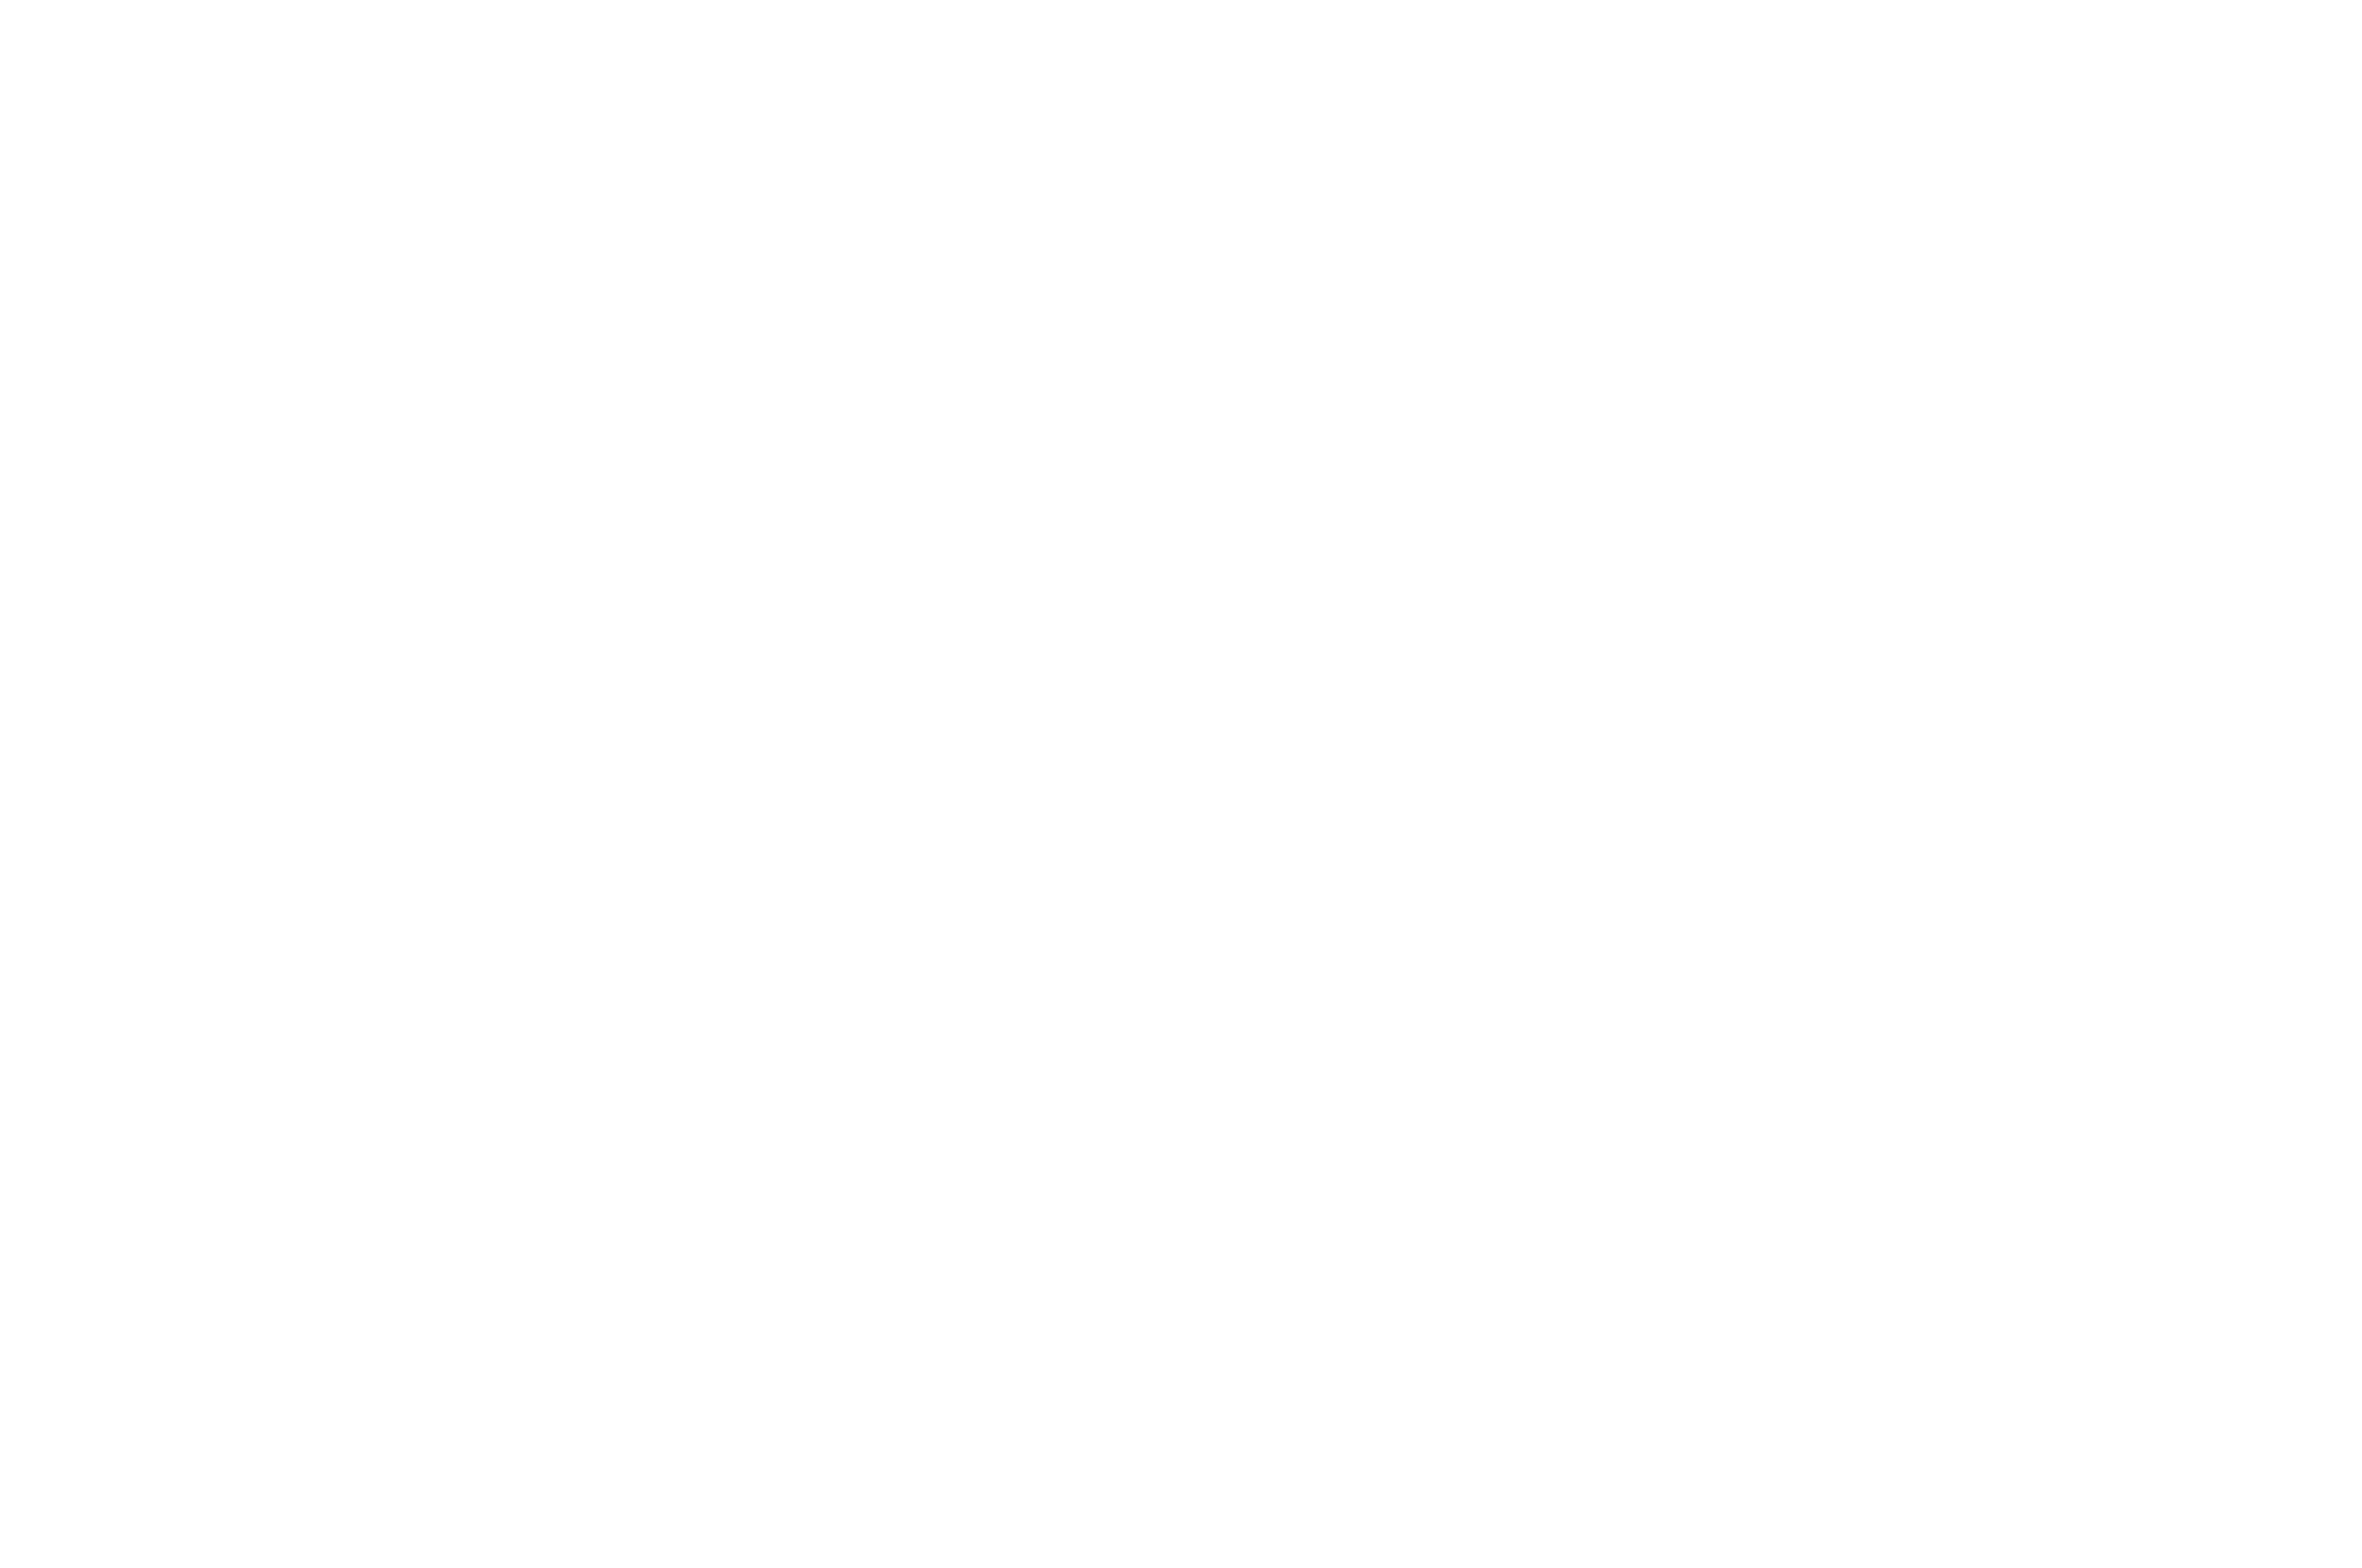 12. Guelph Film Festival (wht).png